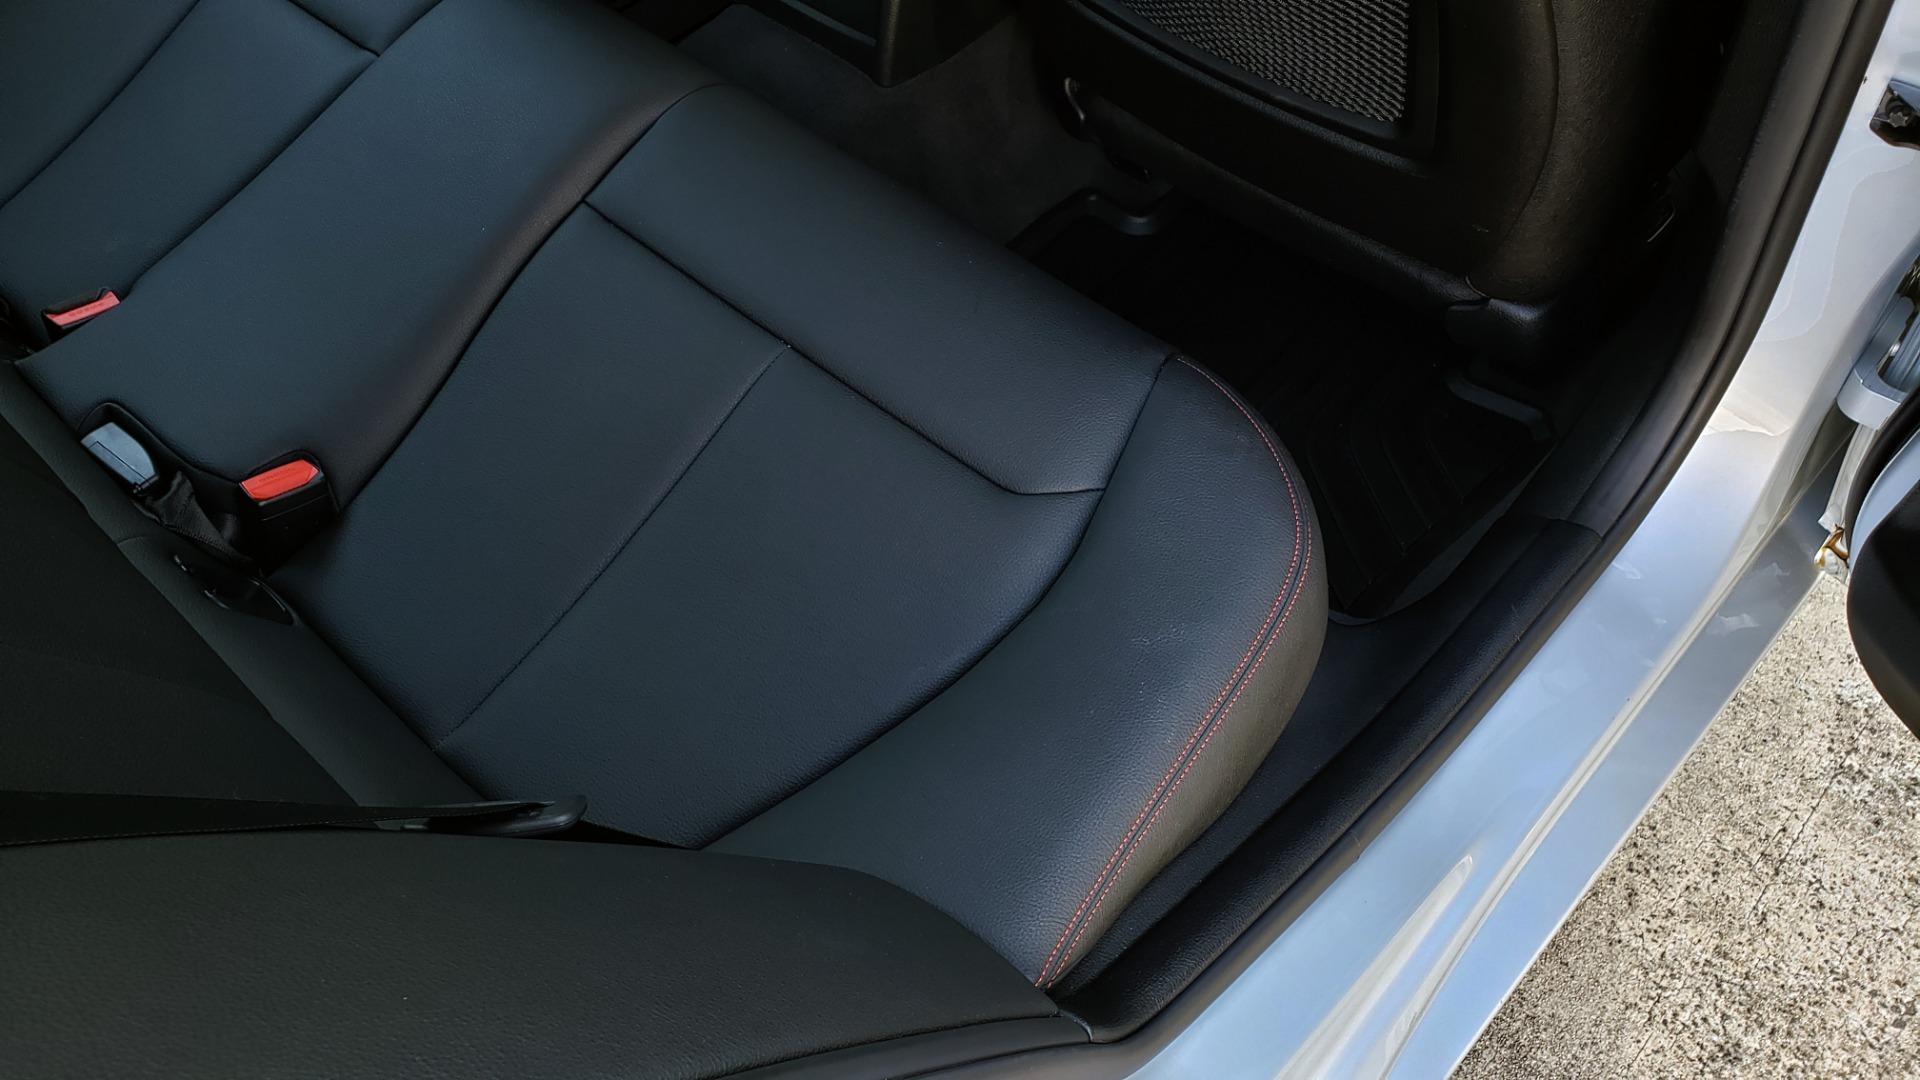 Used 2017 BMW 3 SERIES 330I SPORT SEDAN / DRVR ASST PKG / SUNROOF / REARVIEW for sale Sold at Formula Imports in Charlotte NC 28227 70